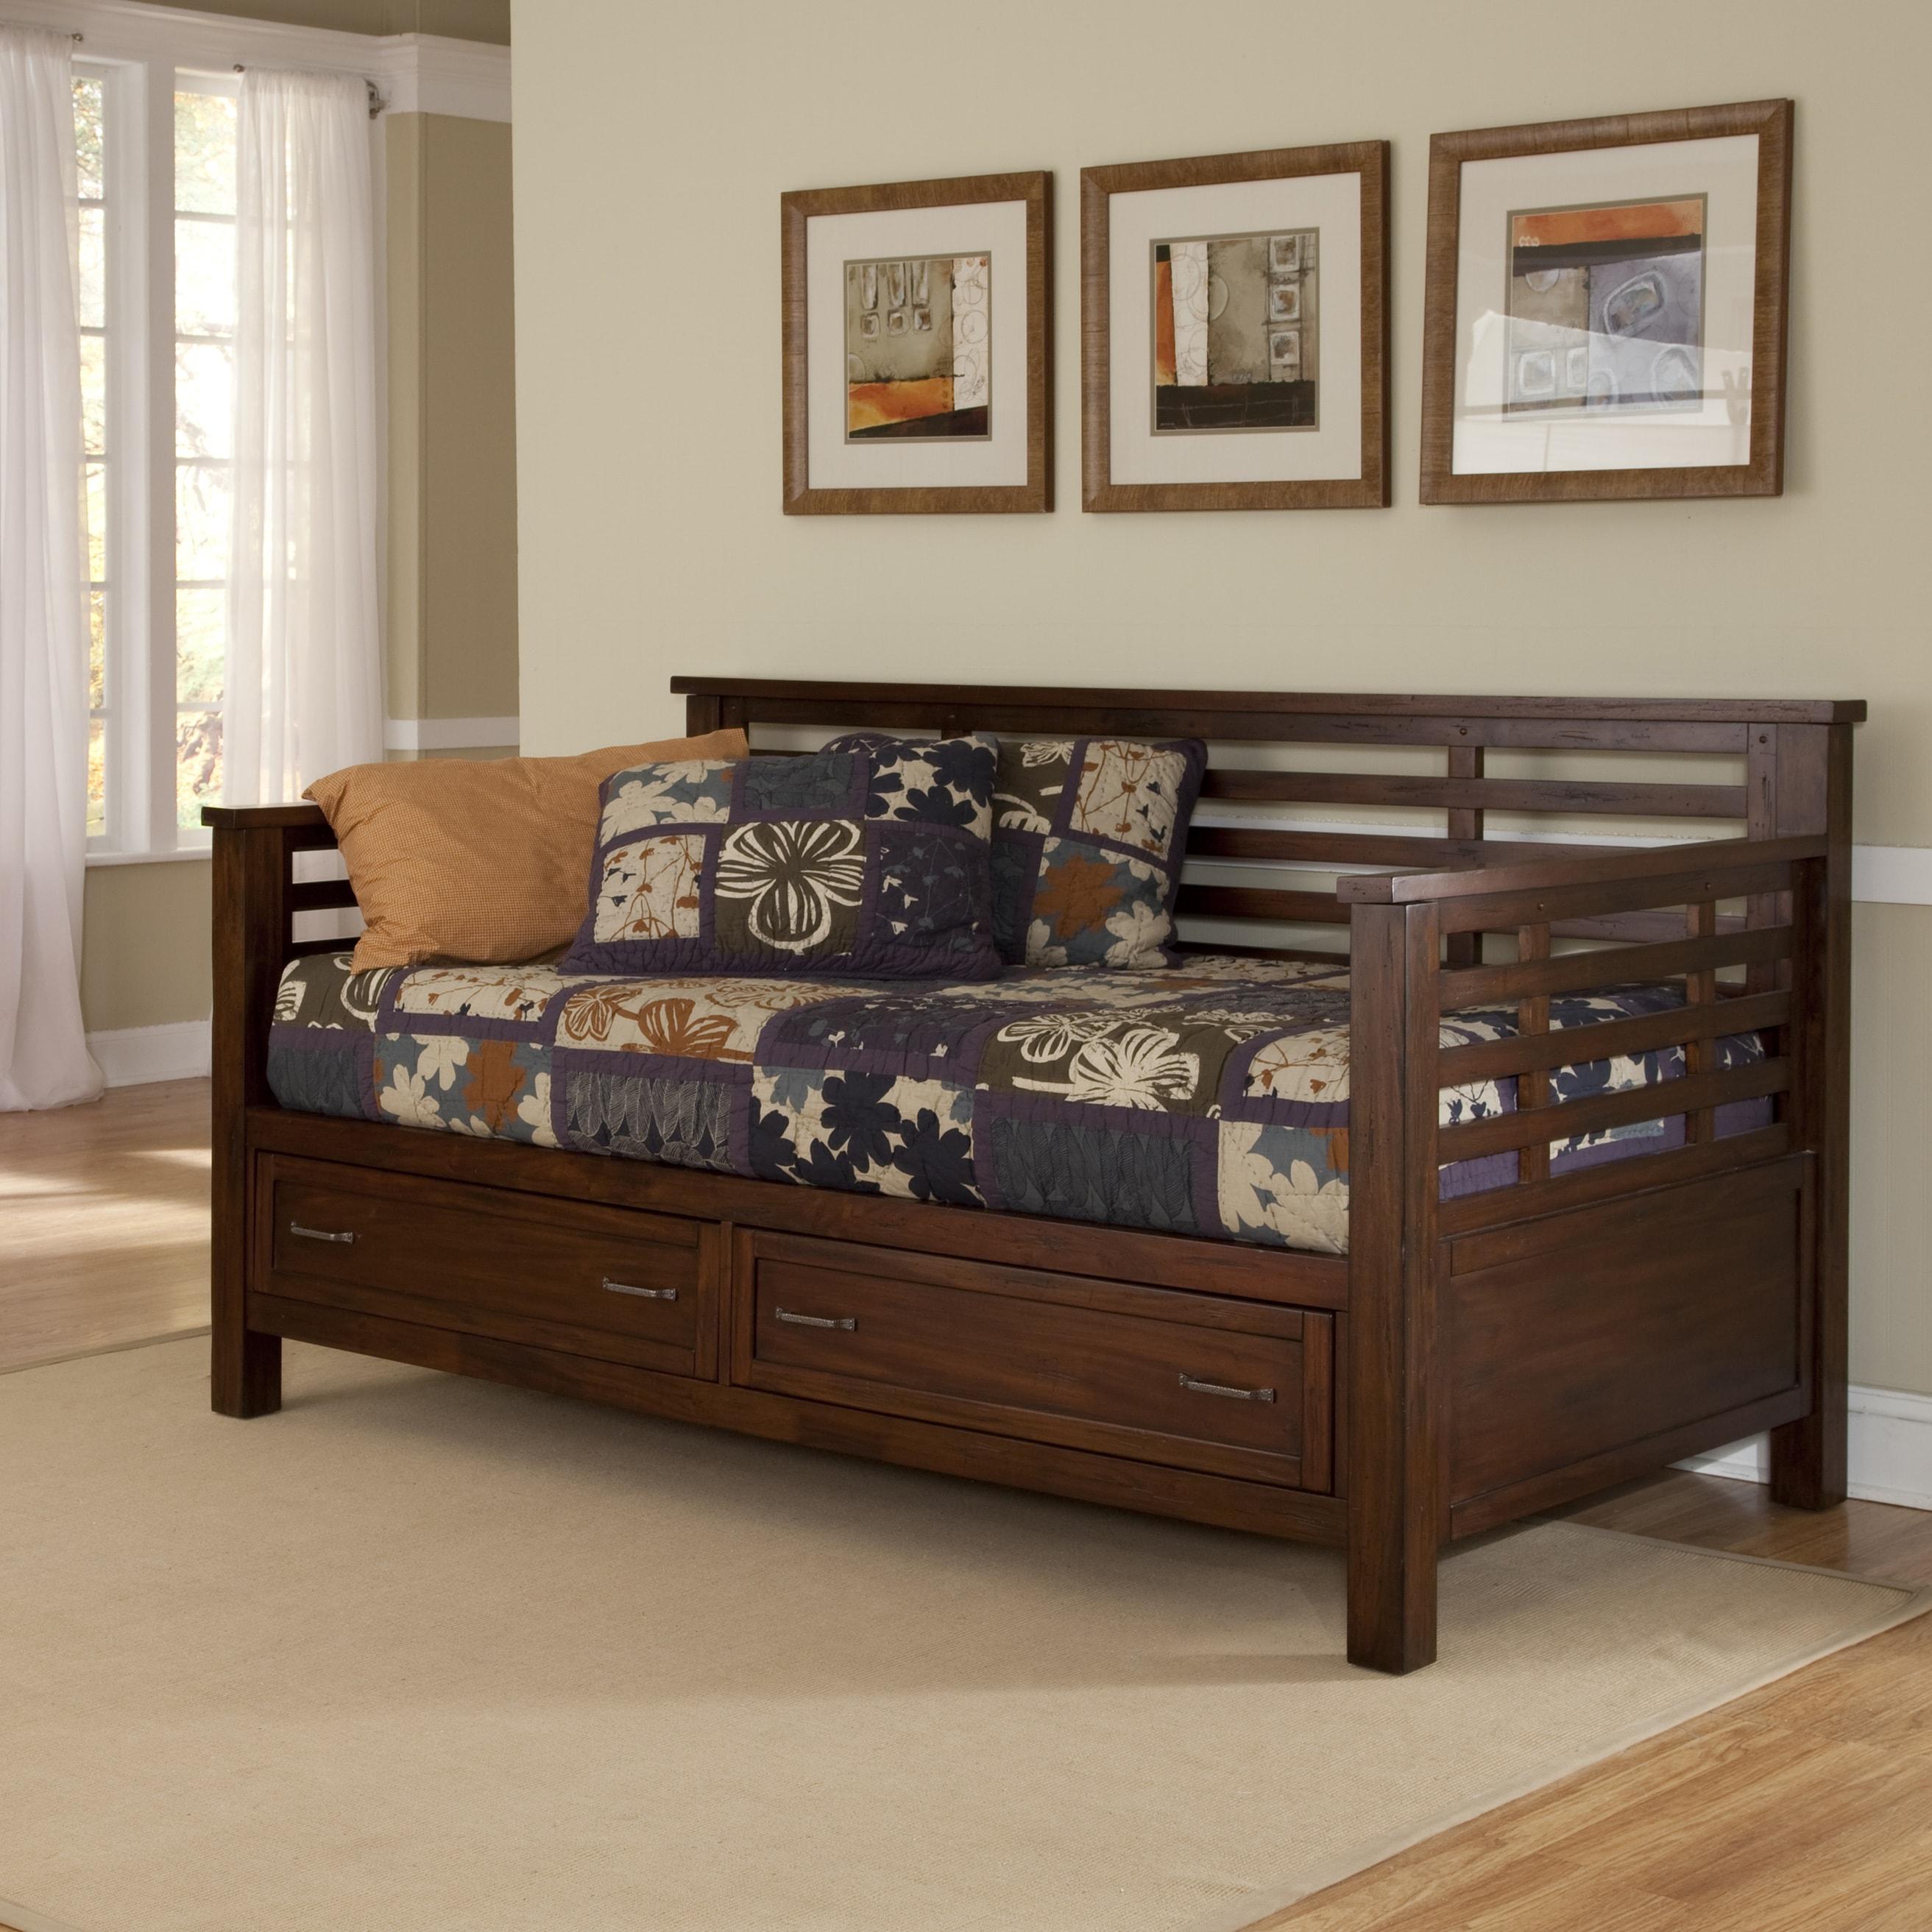 Overstock Com Bedroom Furniture: Cabin Creek Storage Daybed